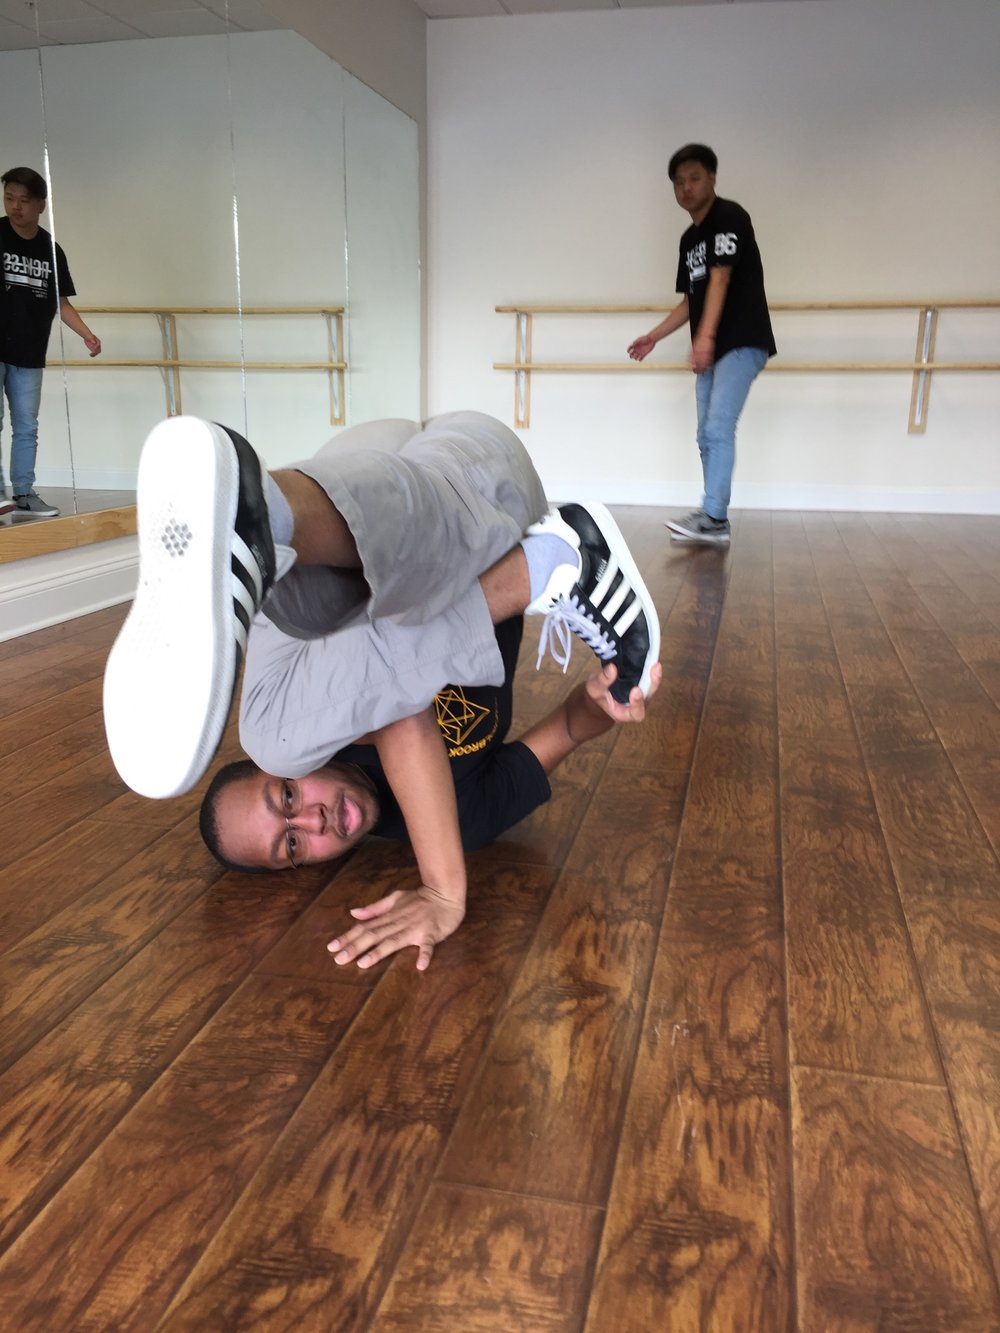 Breakdancing Seminar at Misako Beats